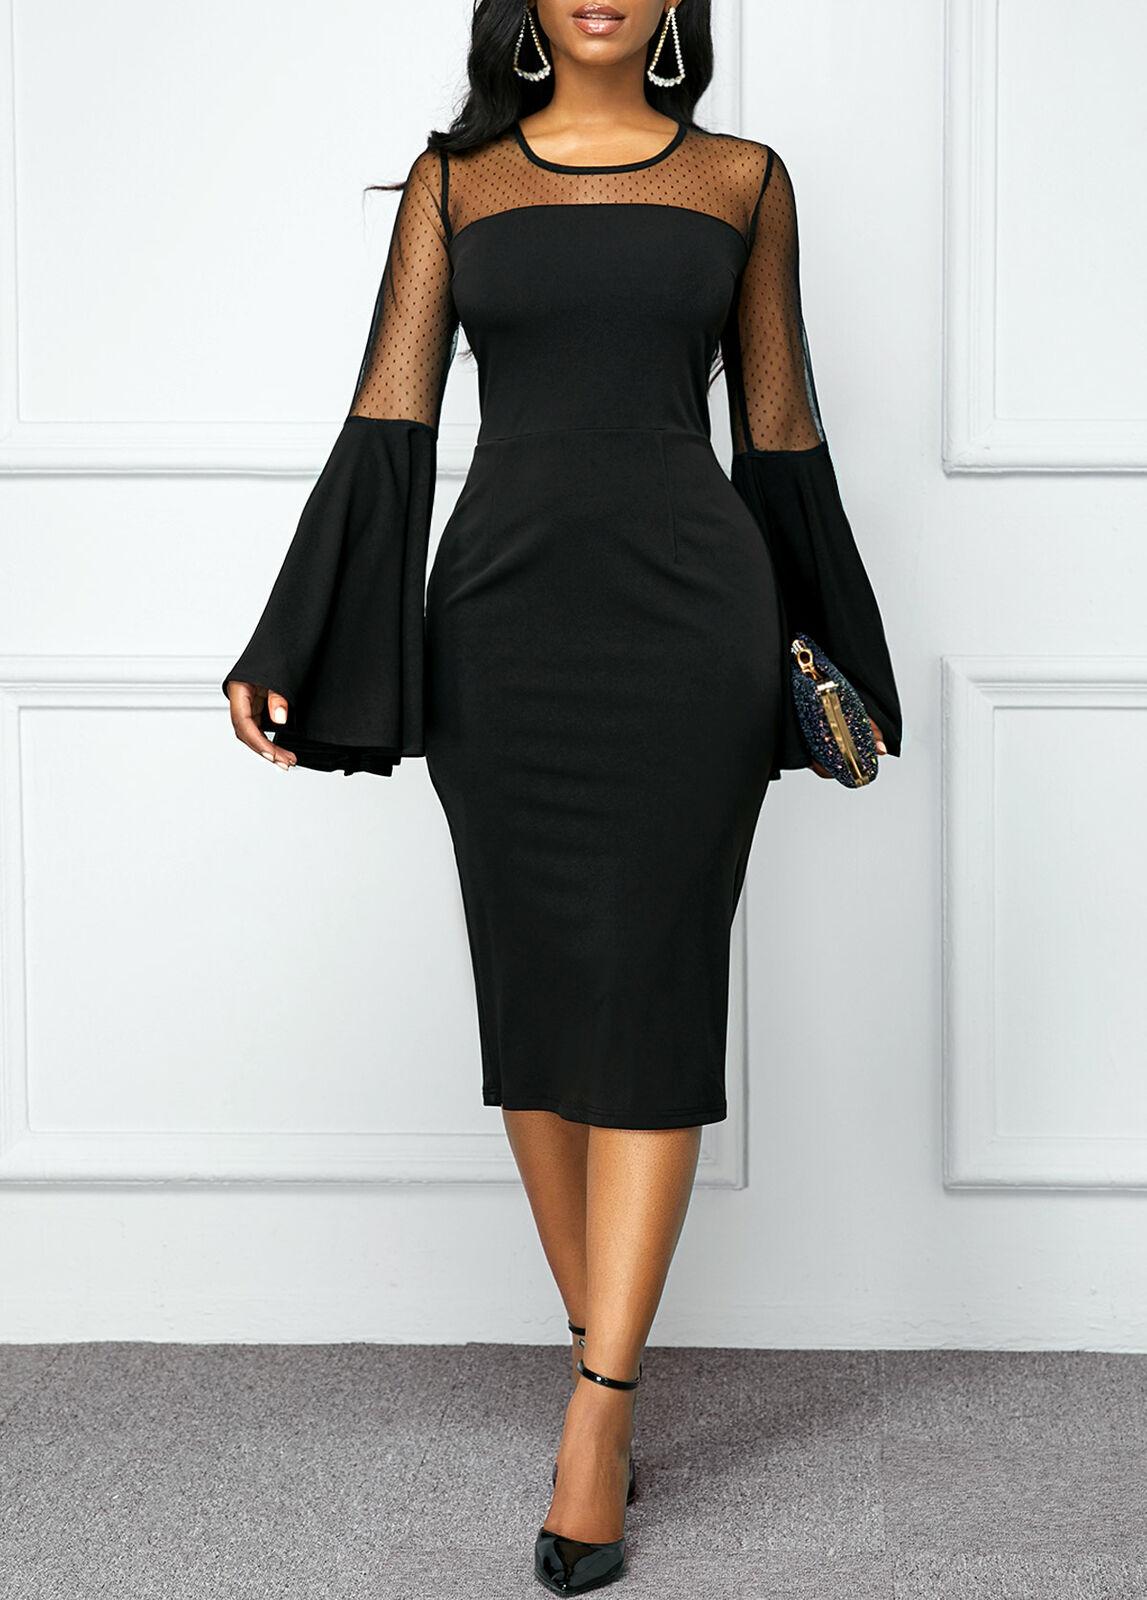 Vintage Bodycon Dress Fashion Women Slim OL Business Office Formal Dress Long Flare Sleeve Winter Dress Party Elegant Dress New